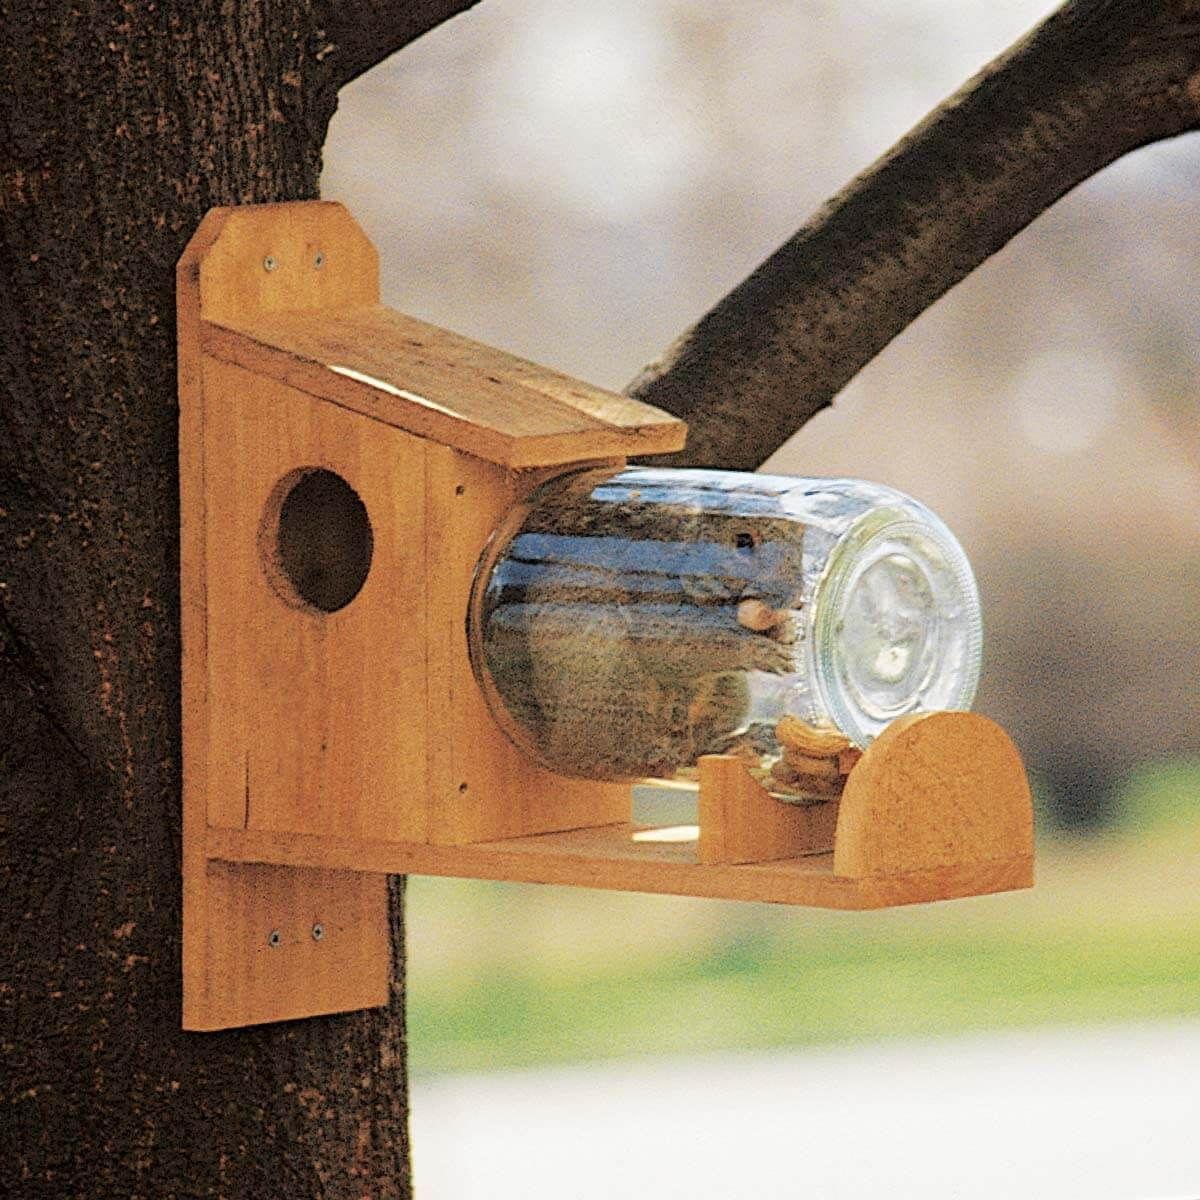 How to Make a Squirrel Feeder Squirrel feeder diy